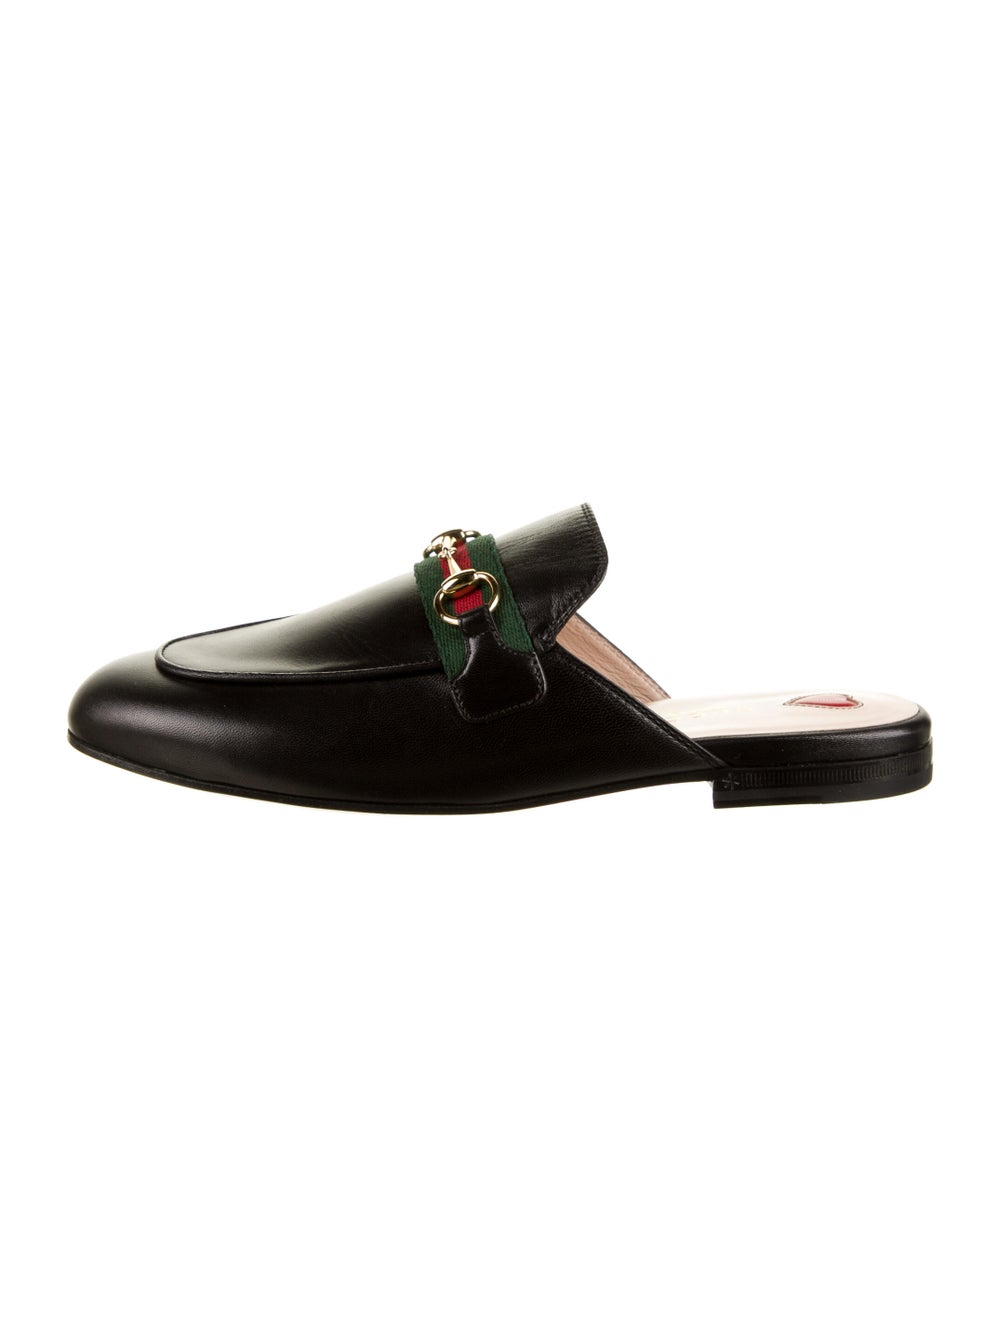 Gucci Princetown Web Accent Mules Black - image 1